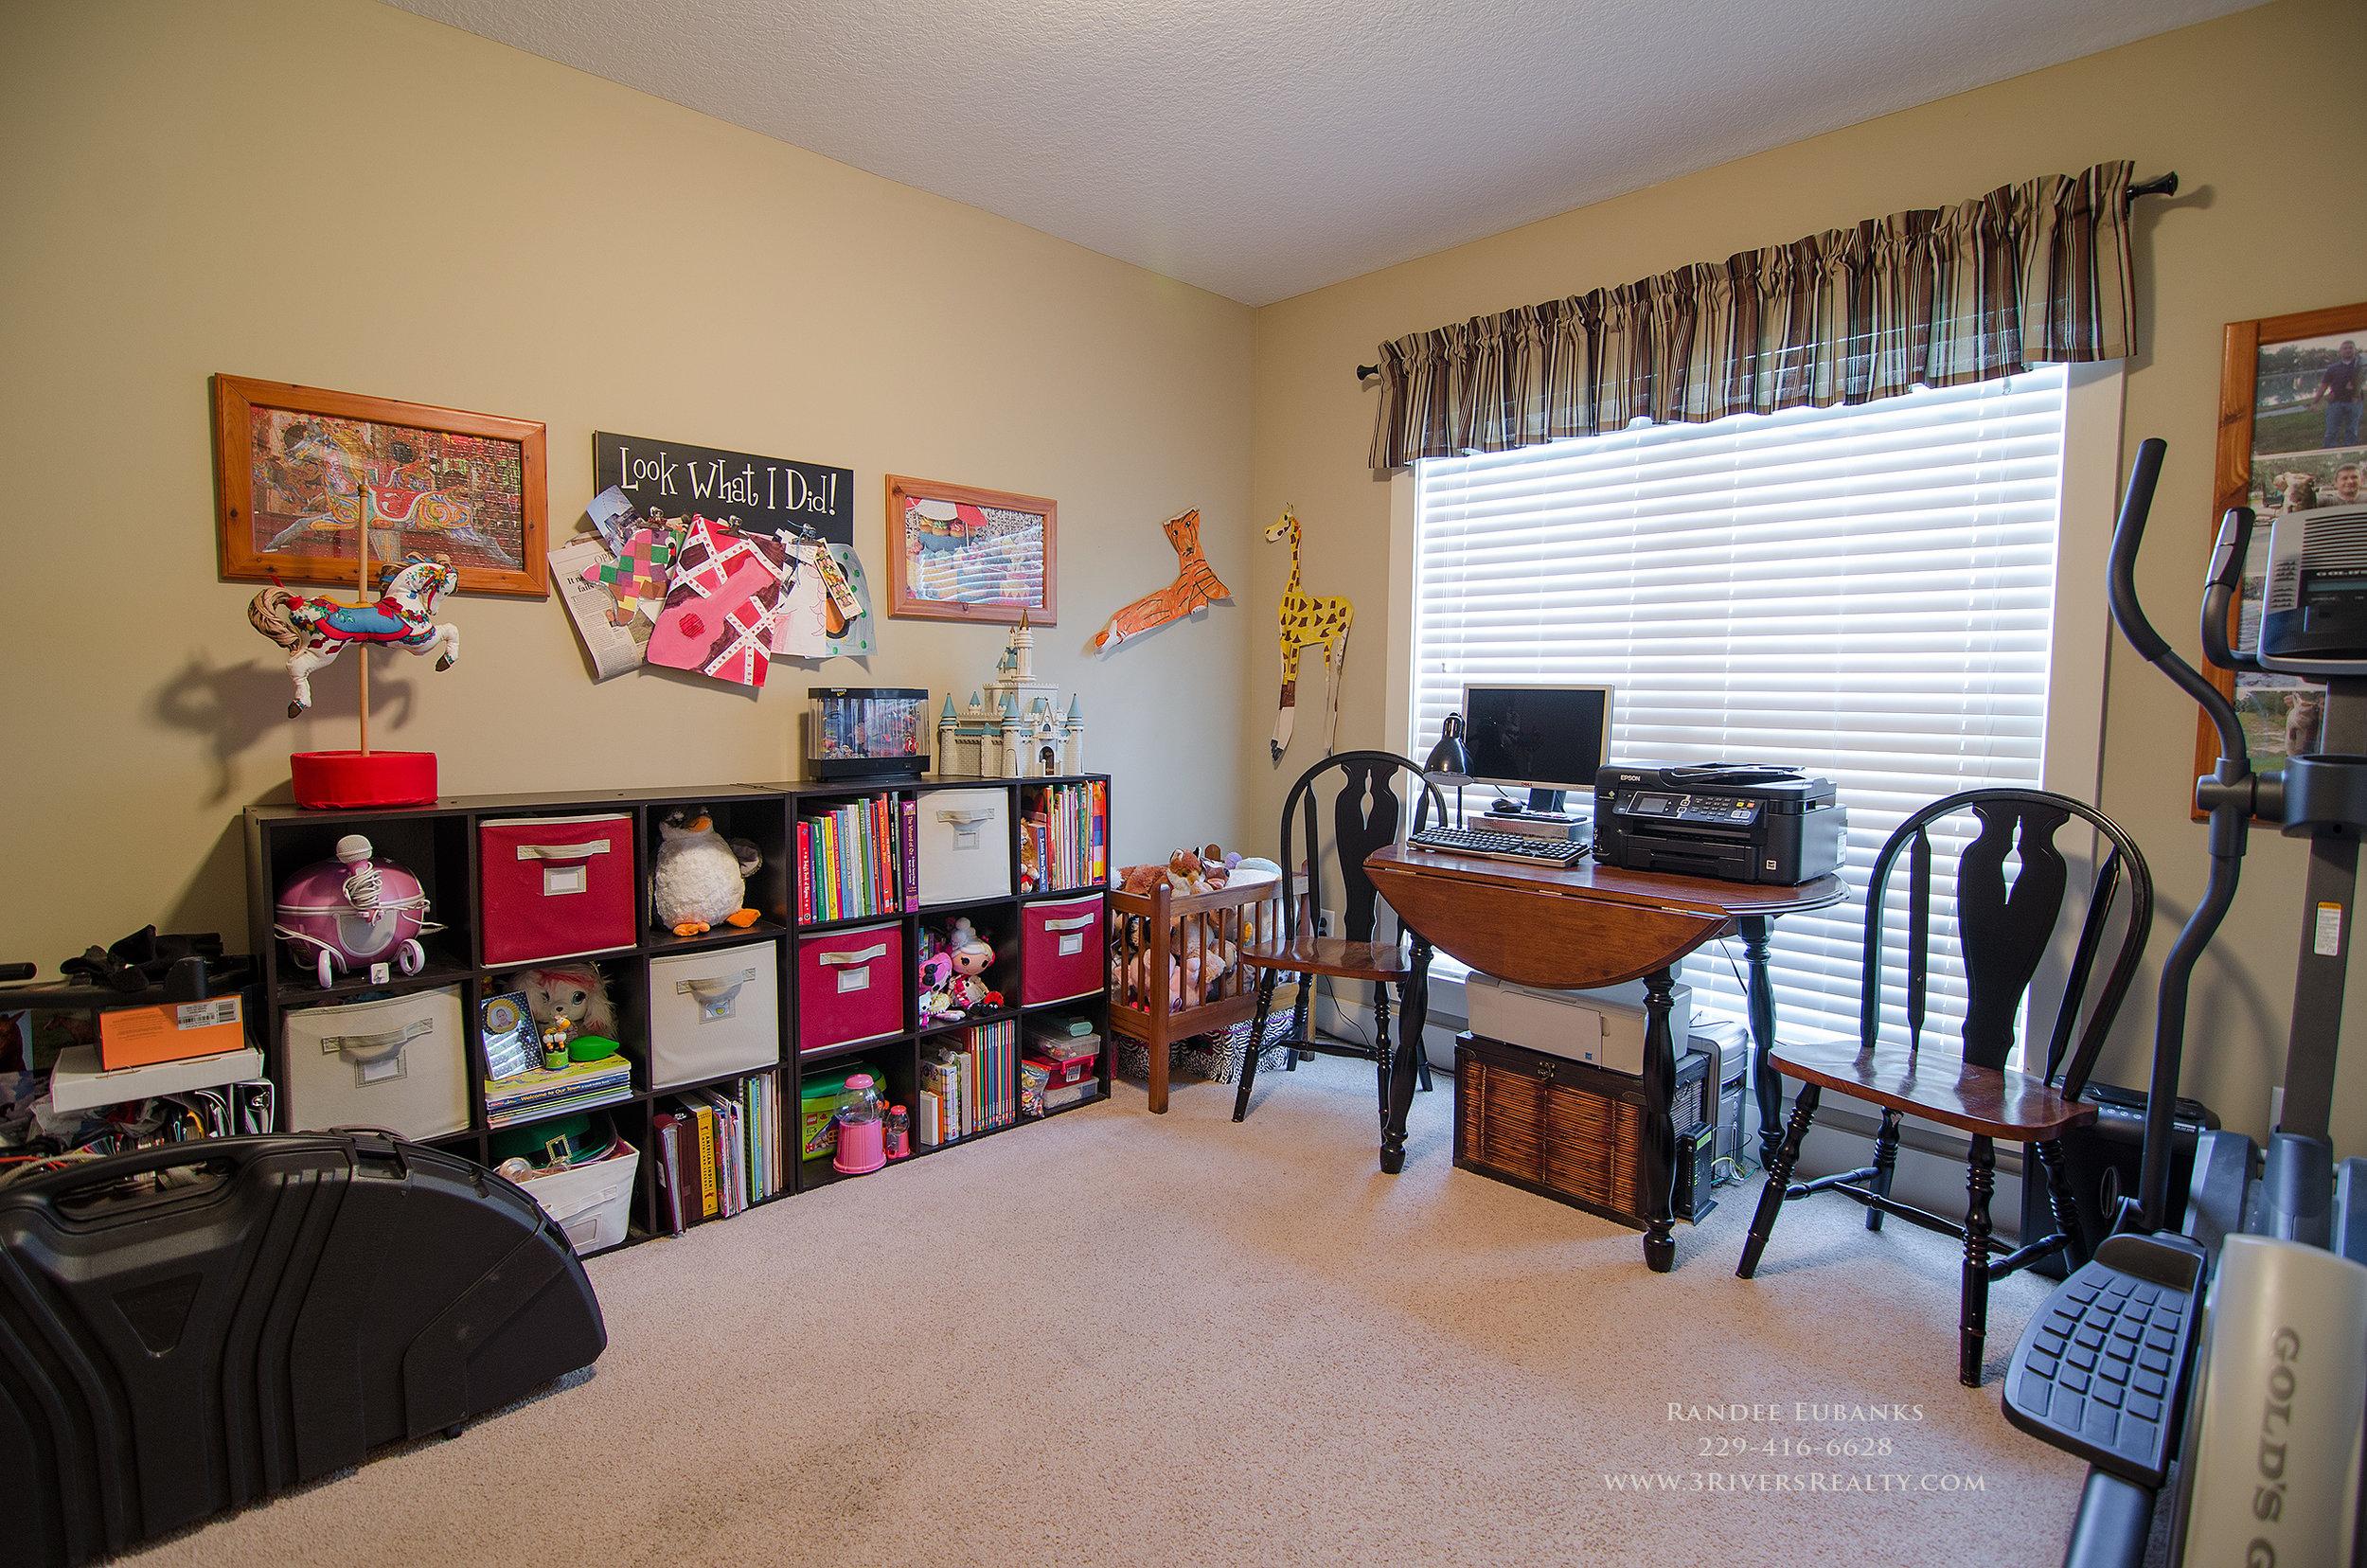 3riversrealty_bainbridge-georgia-home-for-sale_3-bed-2-bath_outdoor-fireplace_three-rivers-realty_mills-brock_Taurus-USA_-pool_back-porch-bedroom3_office - Copy.jpg